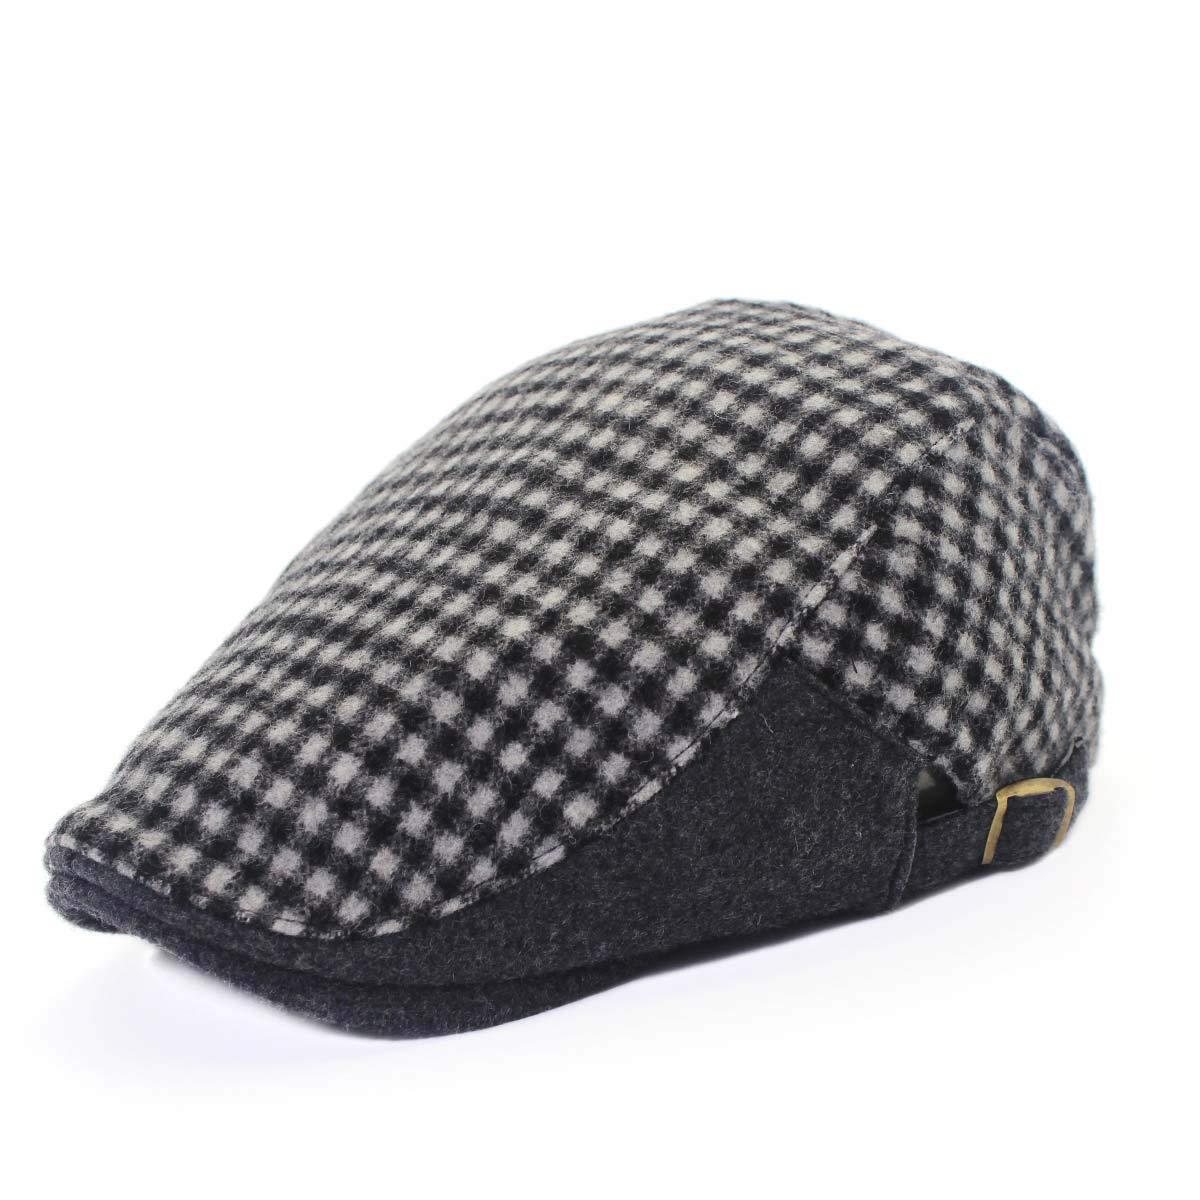 outfly Unisex Duckbill Flat hat Vintage Newsboy Wool Gatsby Flat Cap Men's Winter Berets B11026-B